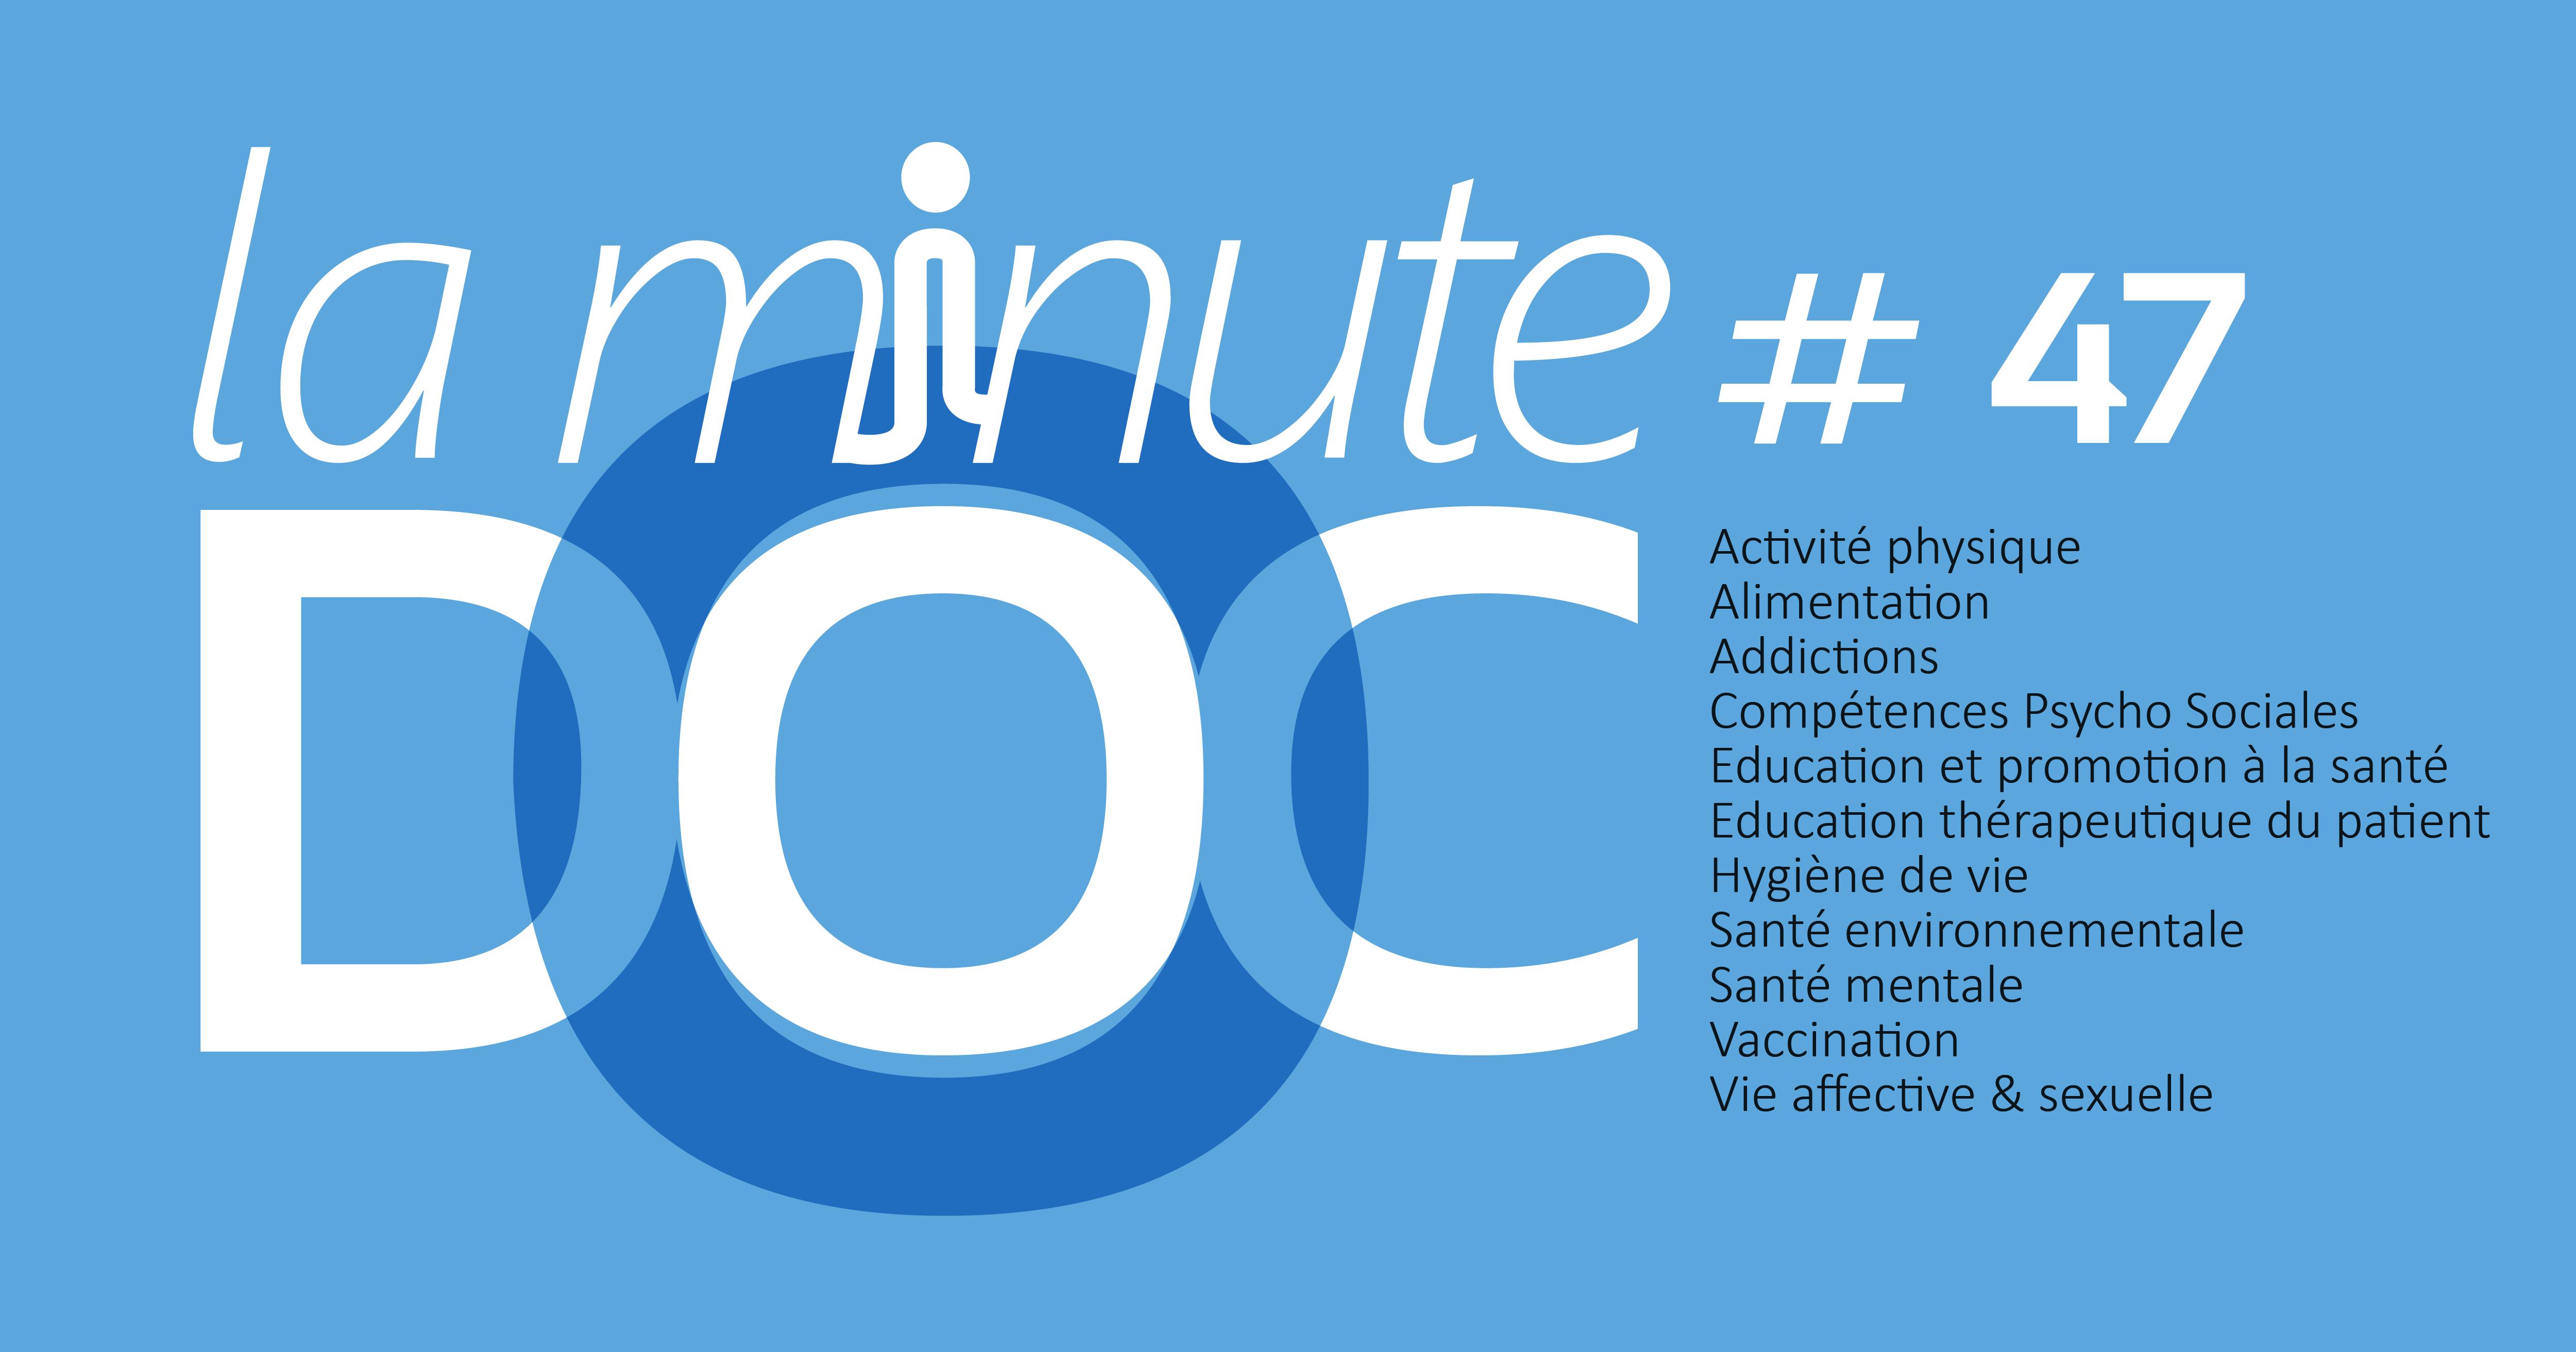 la minute doc #47